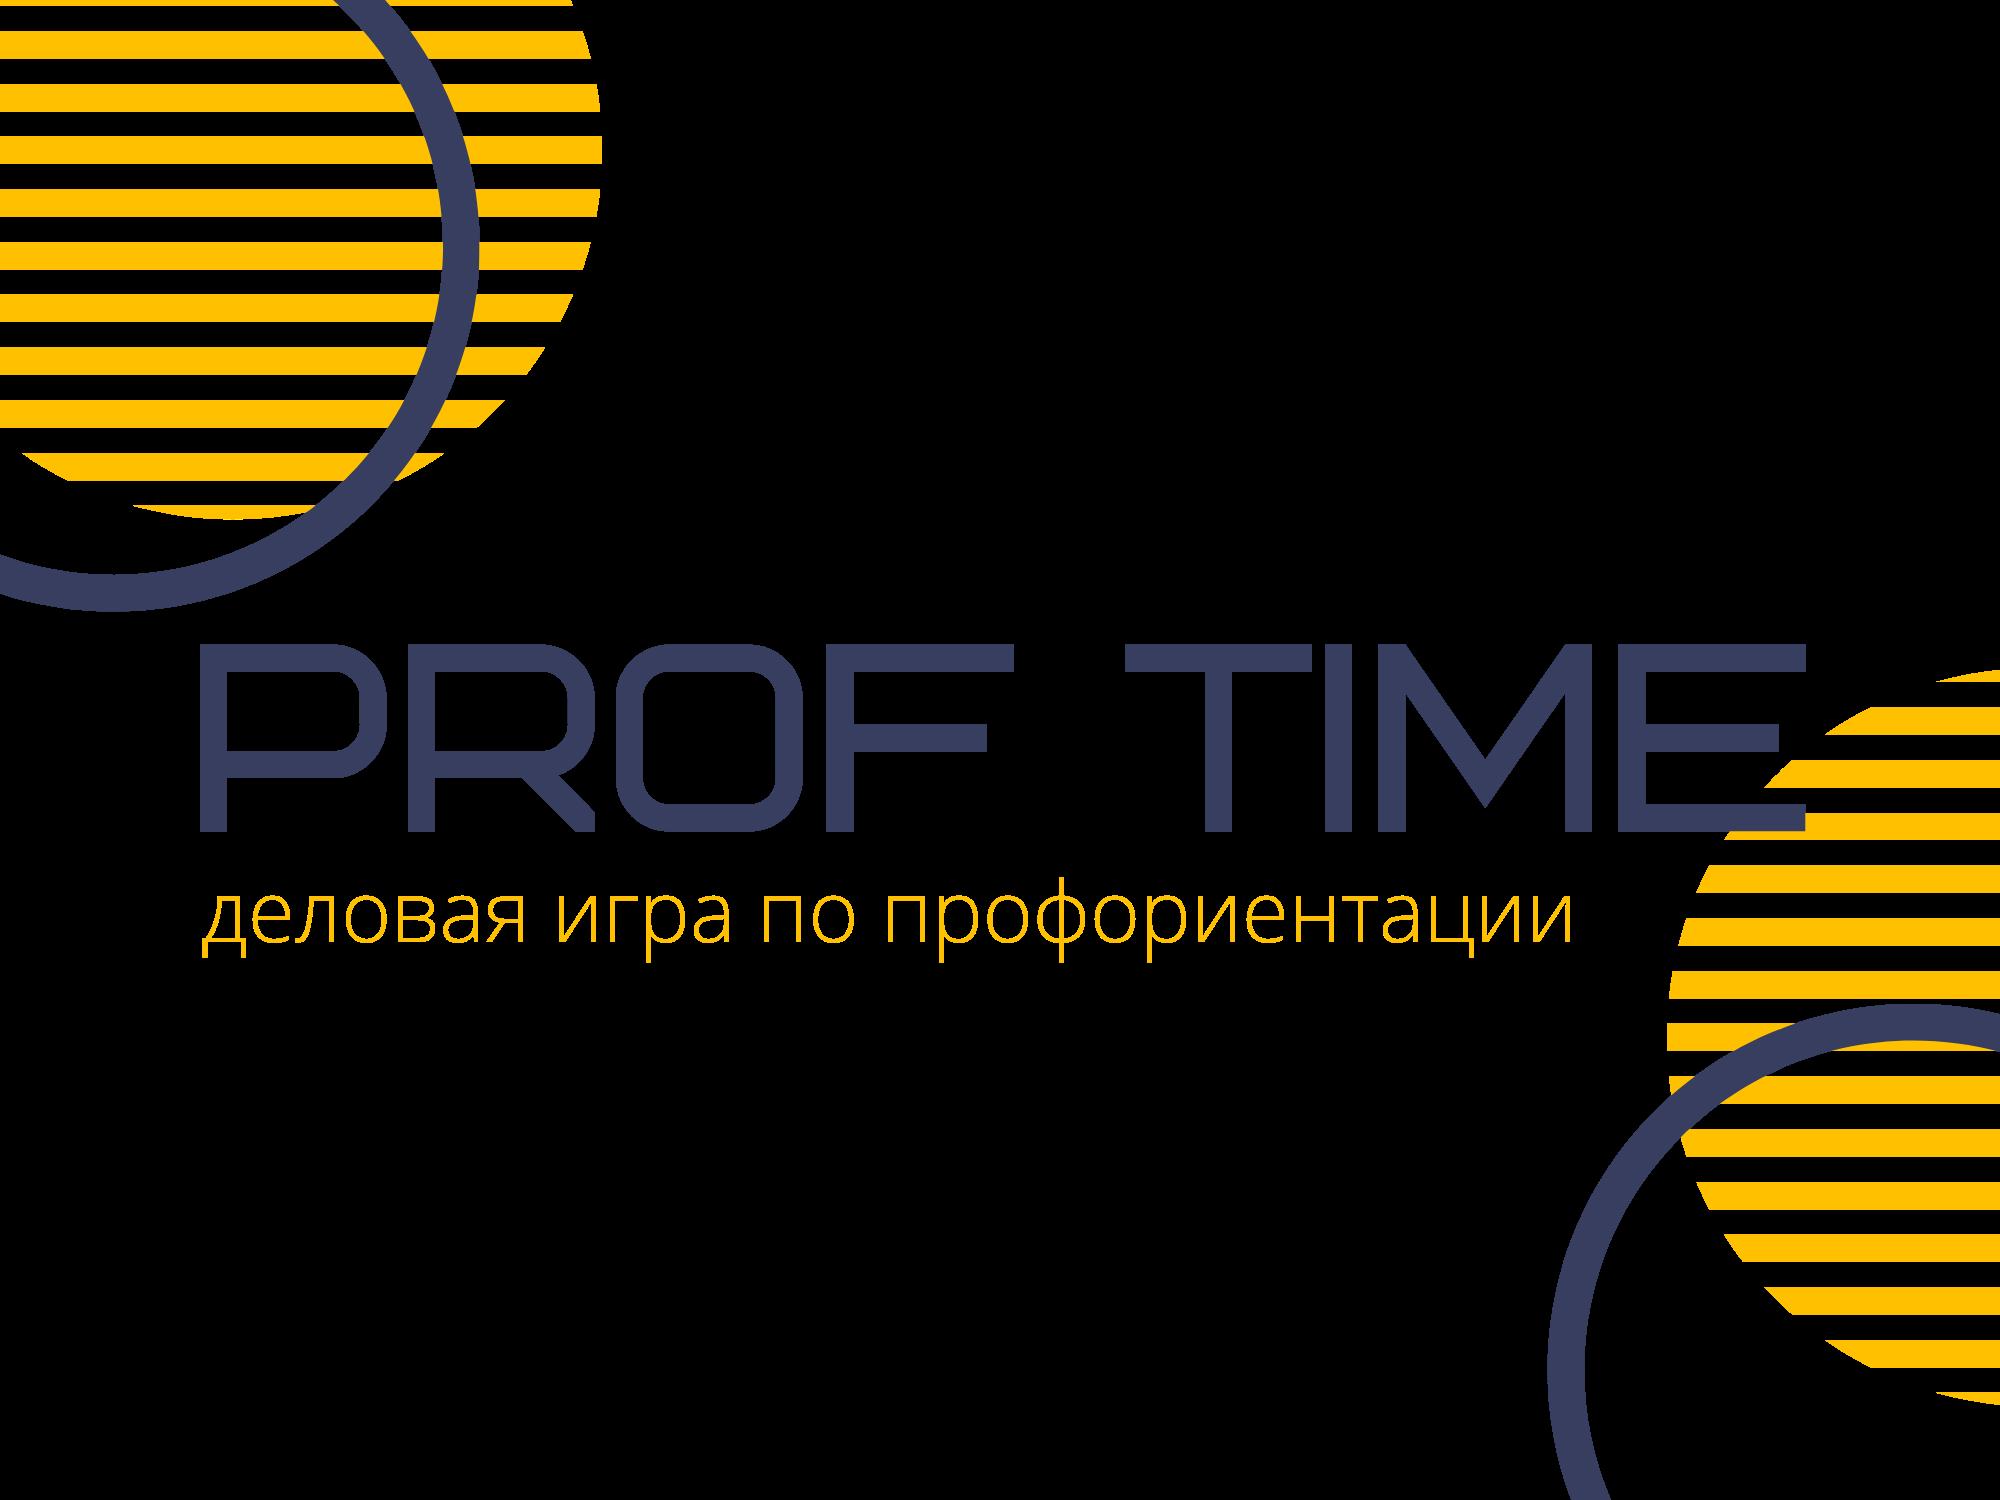 Prof Time